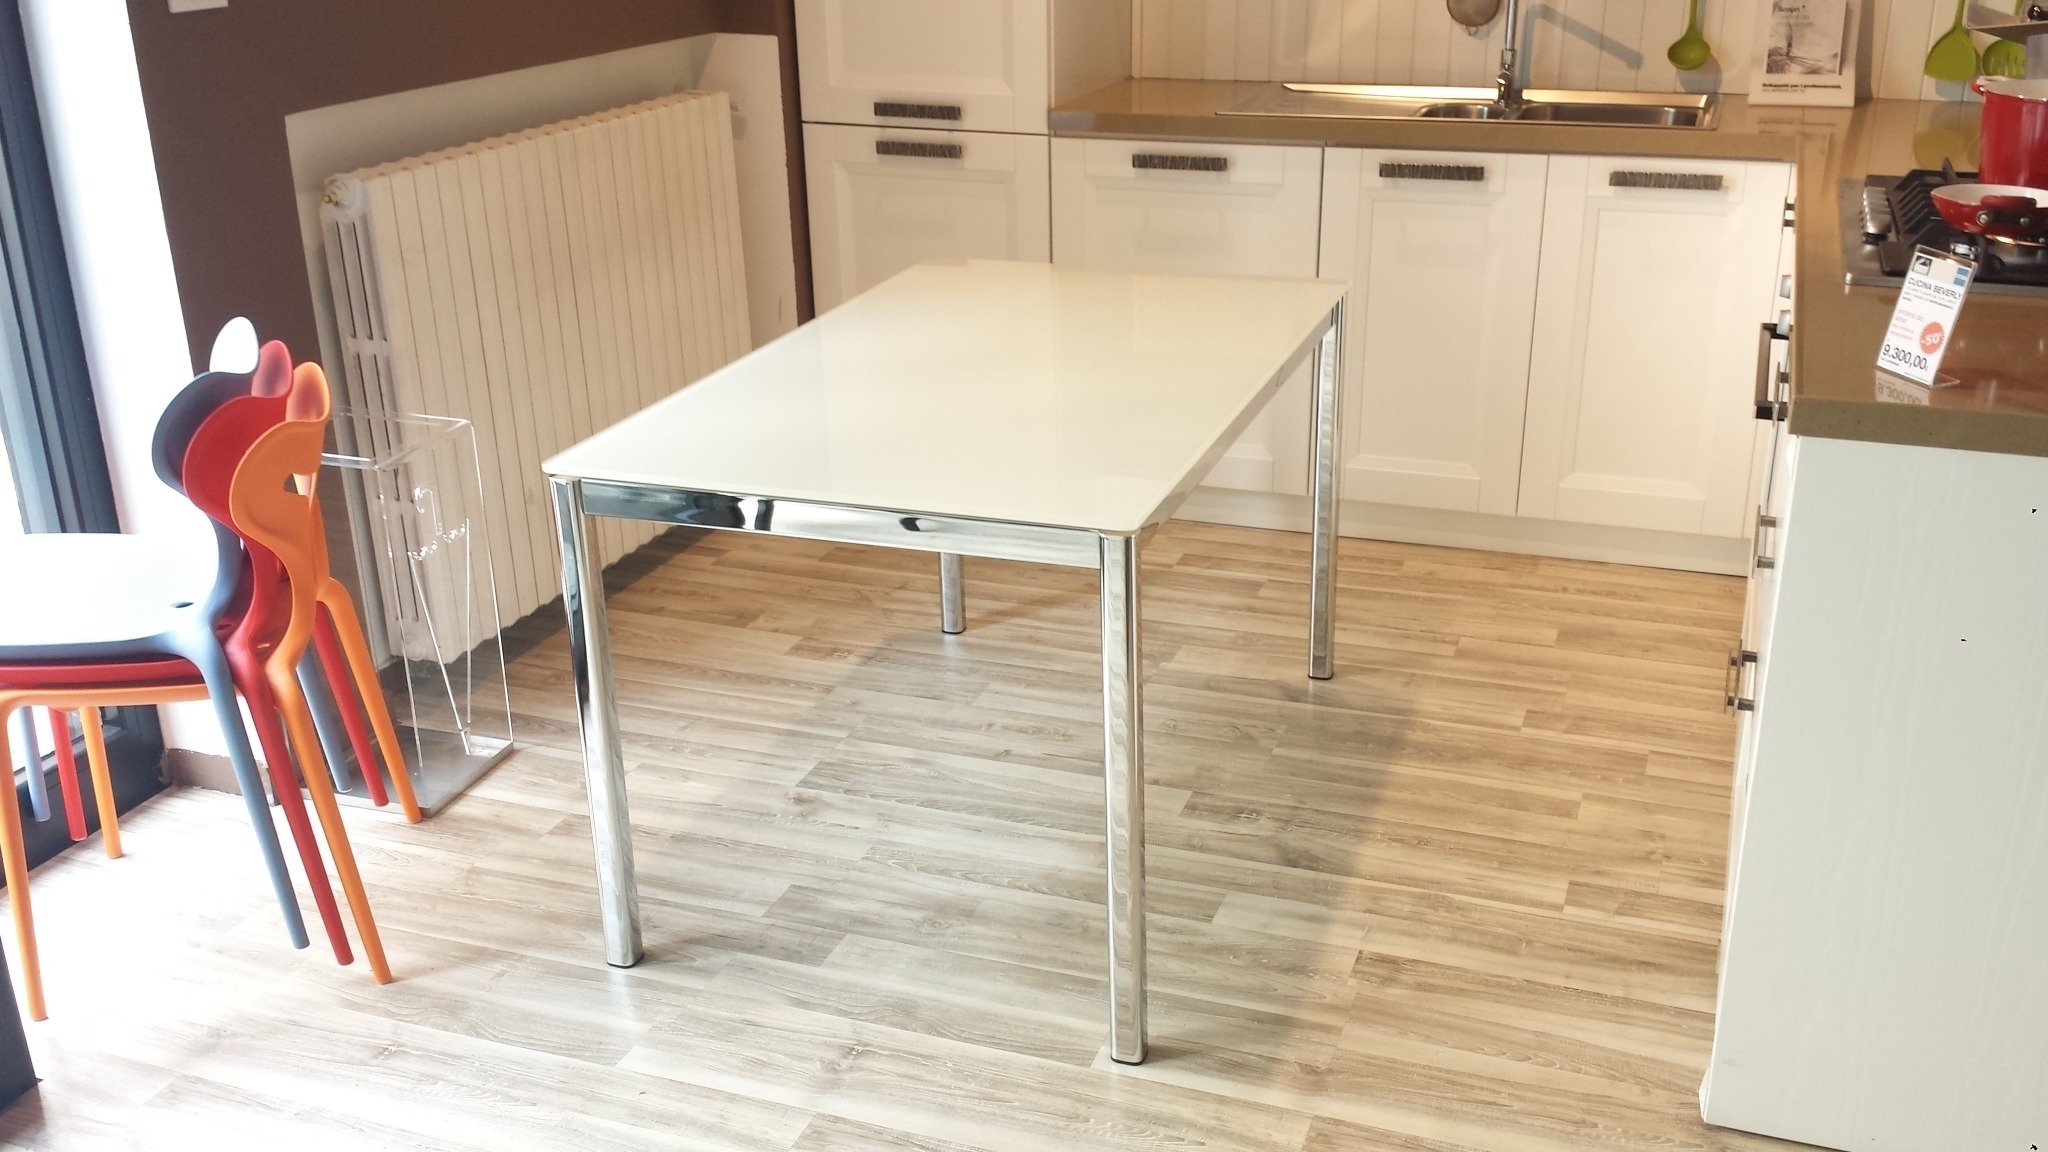 Tavolo da cucina allungabile performance 20256 tavoli a - Tavolo pieghevole cucina ...